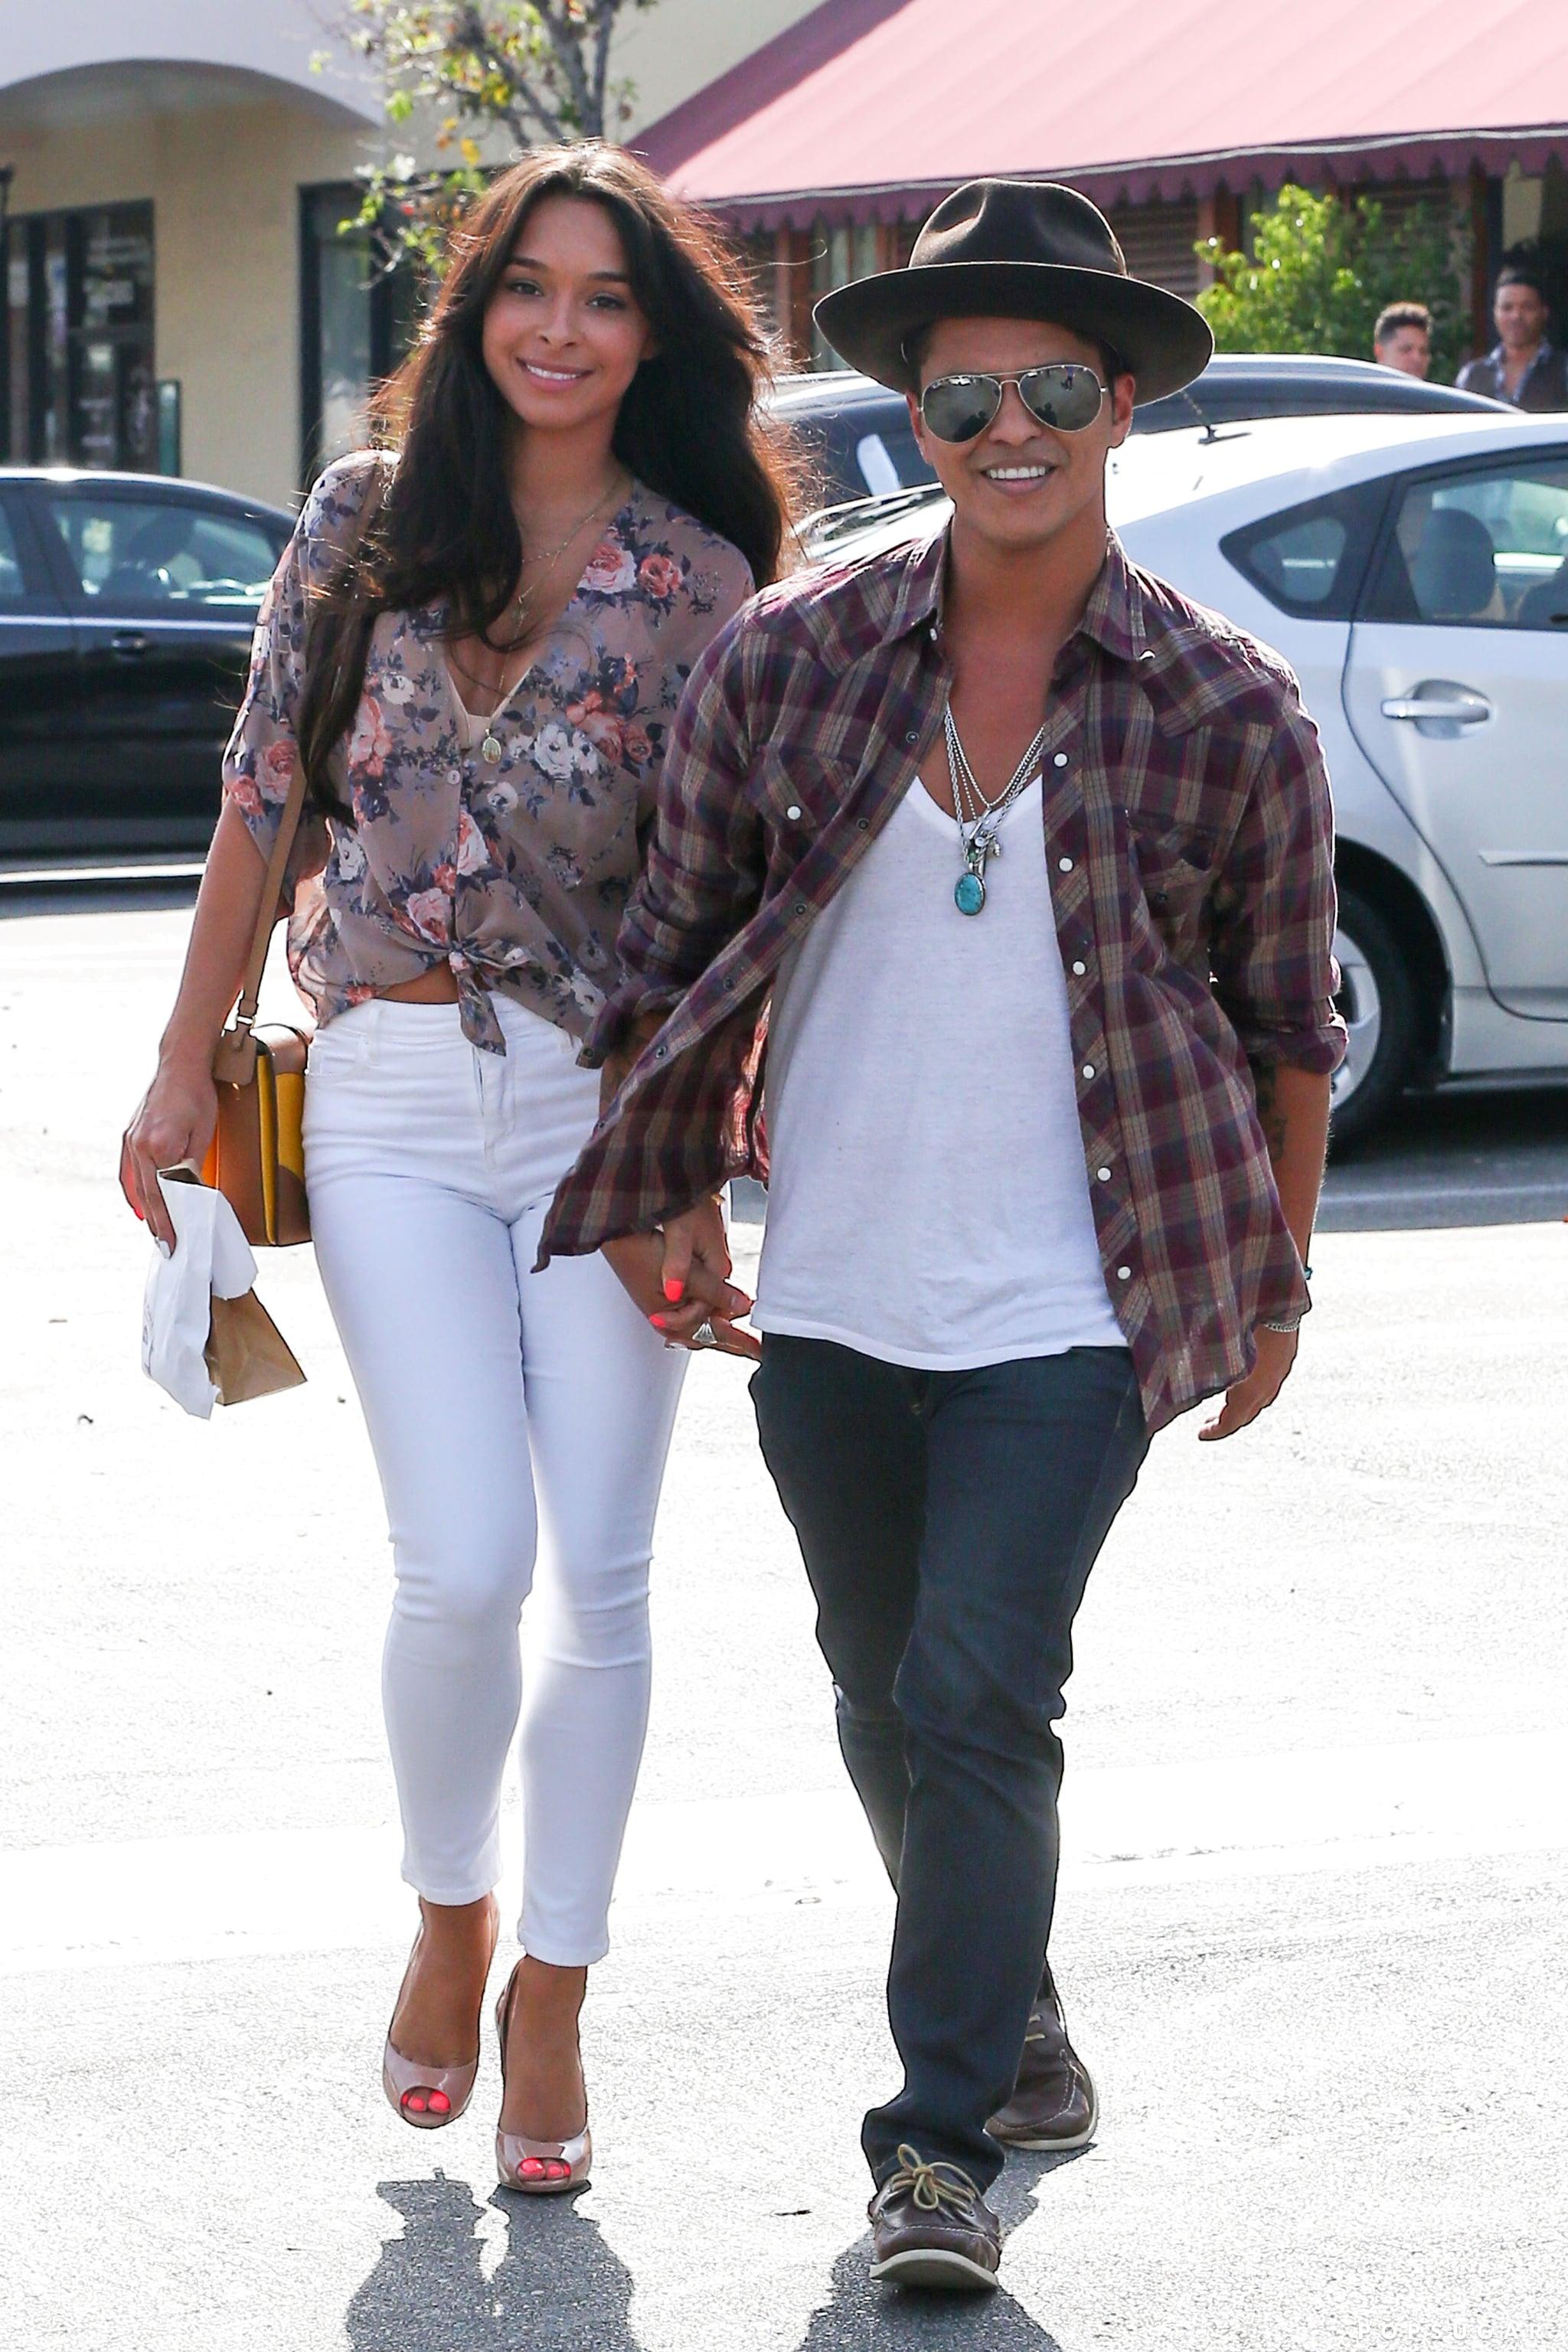 Is bruno mars wife who Bruno Mars'